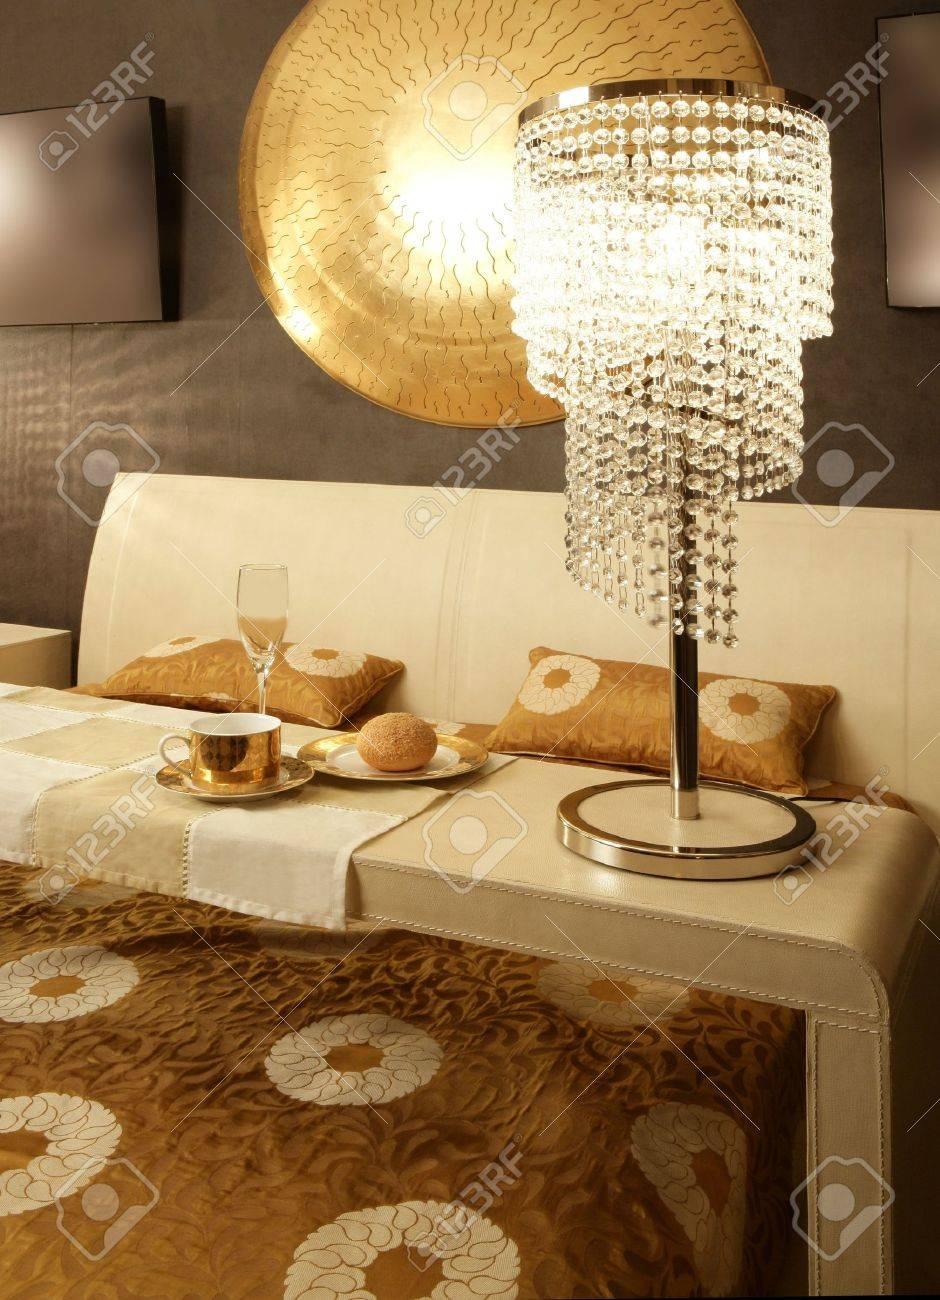 Asian modern bedroom breakfast table luxury interior design Stock Photo - 8385030